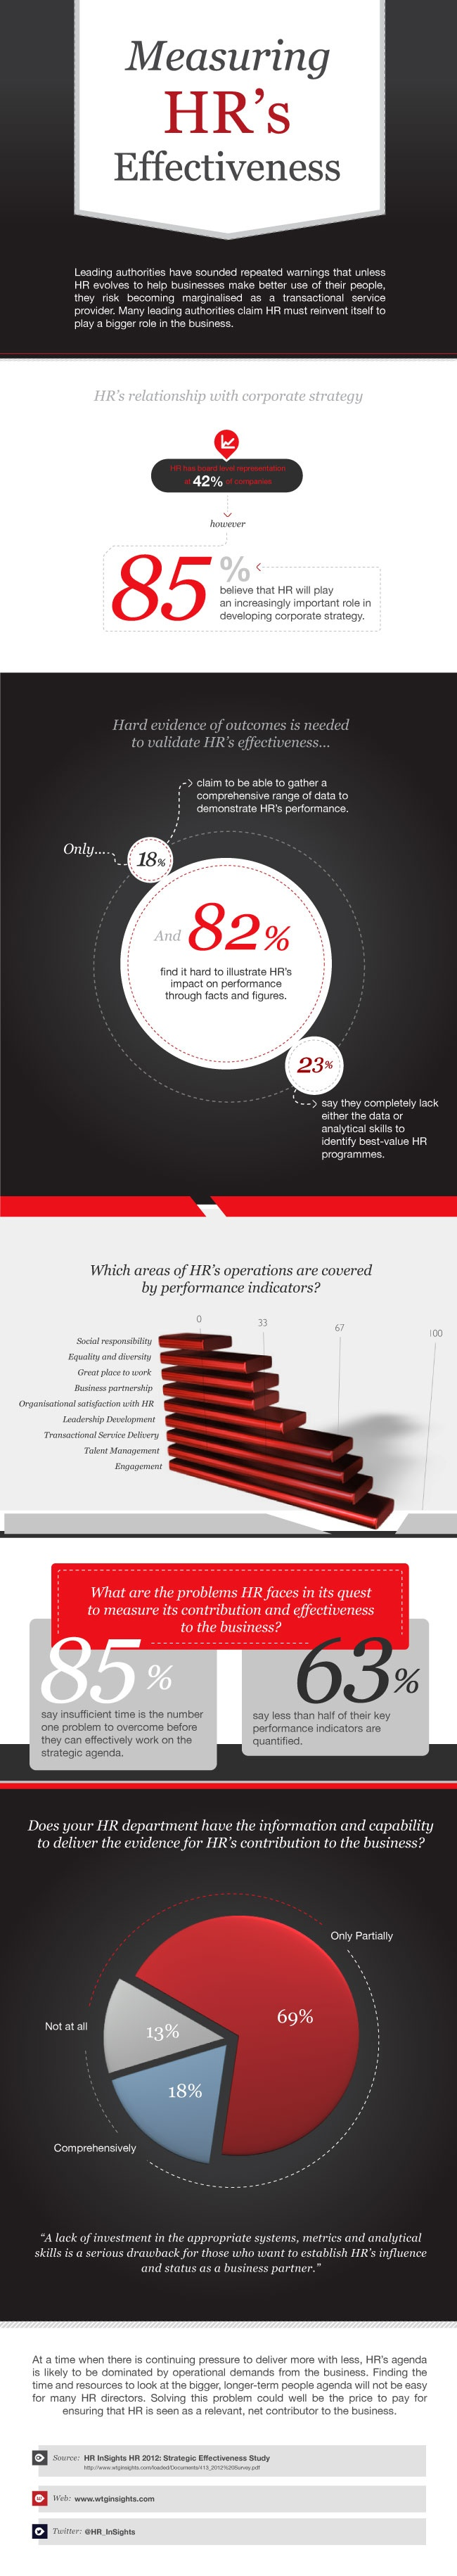 Measuring HRu0027s Effectiveness Infographic 44 best HR